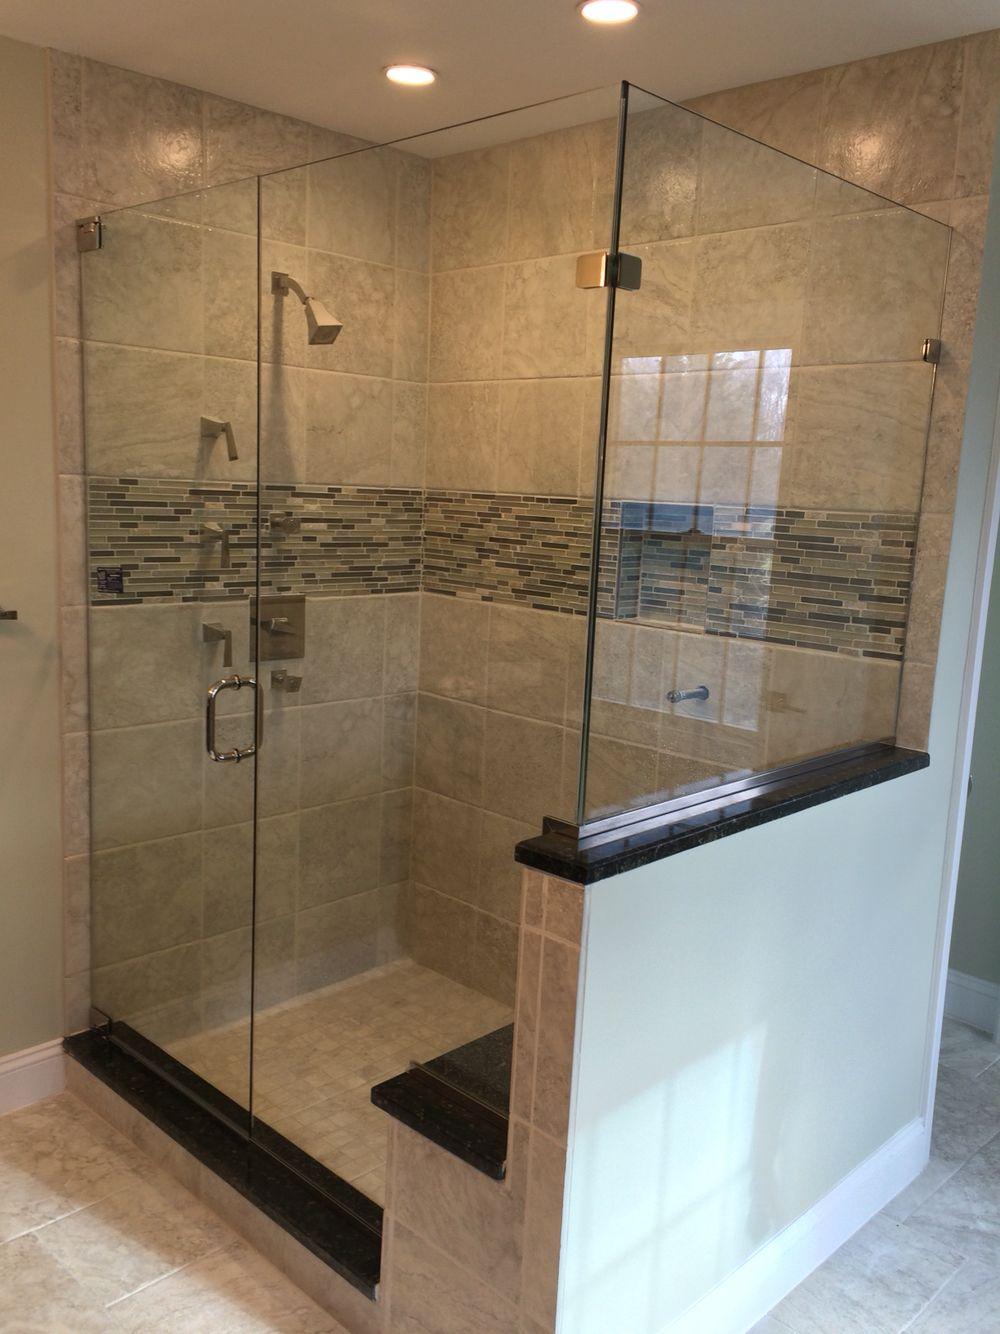 GRANDIOR Brings You This Gorgeous Bathroom Using Bridgewood Custom Cabinetry  And Exotic Brazilian Marble Countertop.